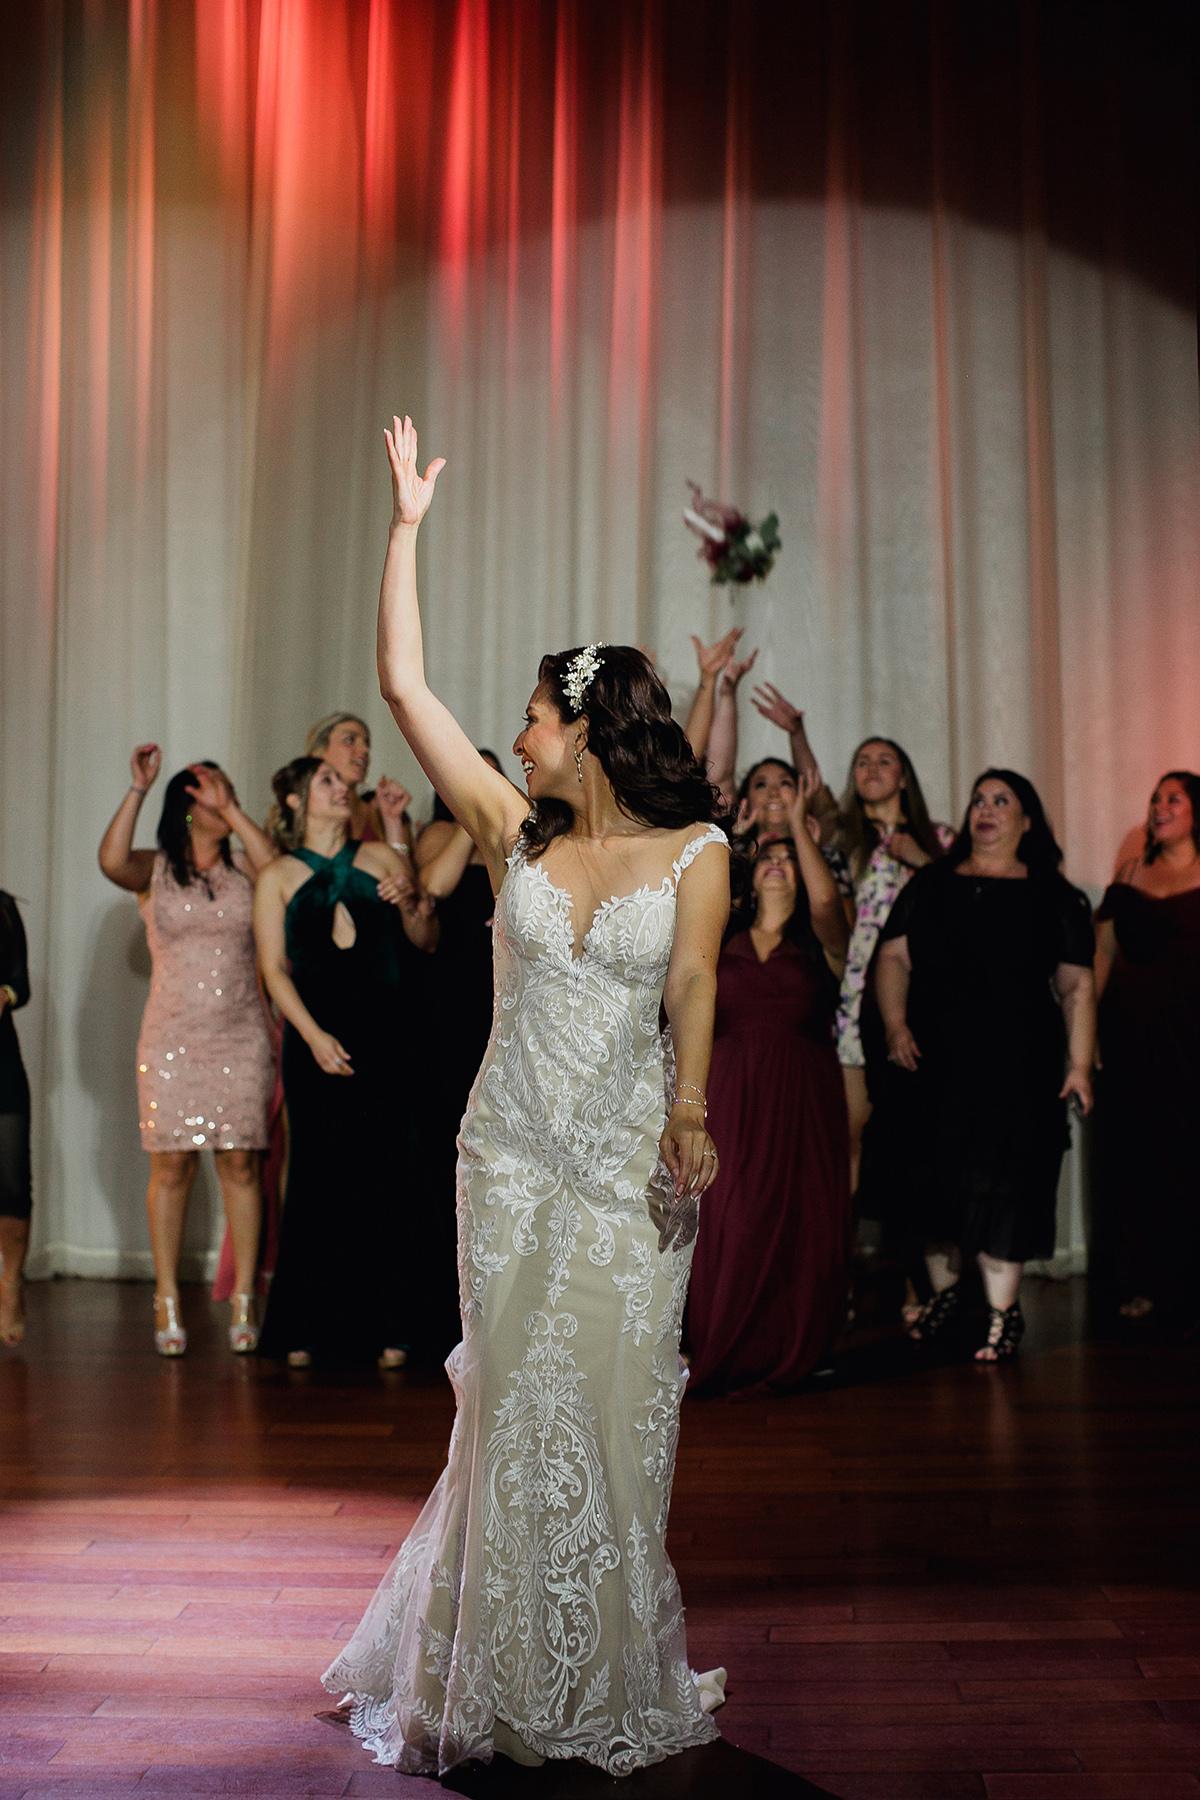 karla_tommy_wedding_125.jpg